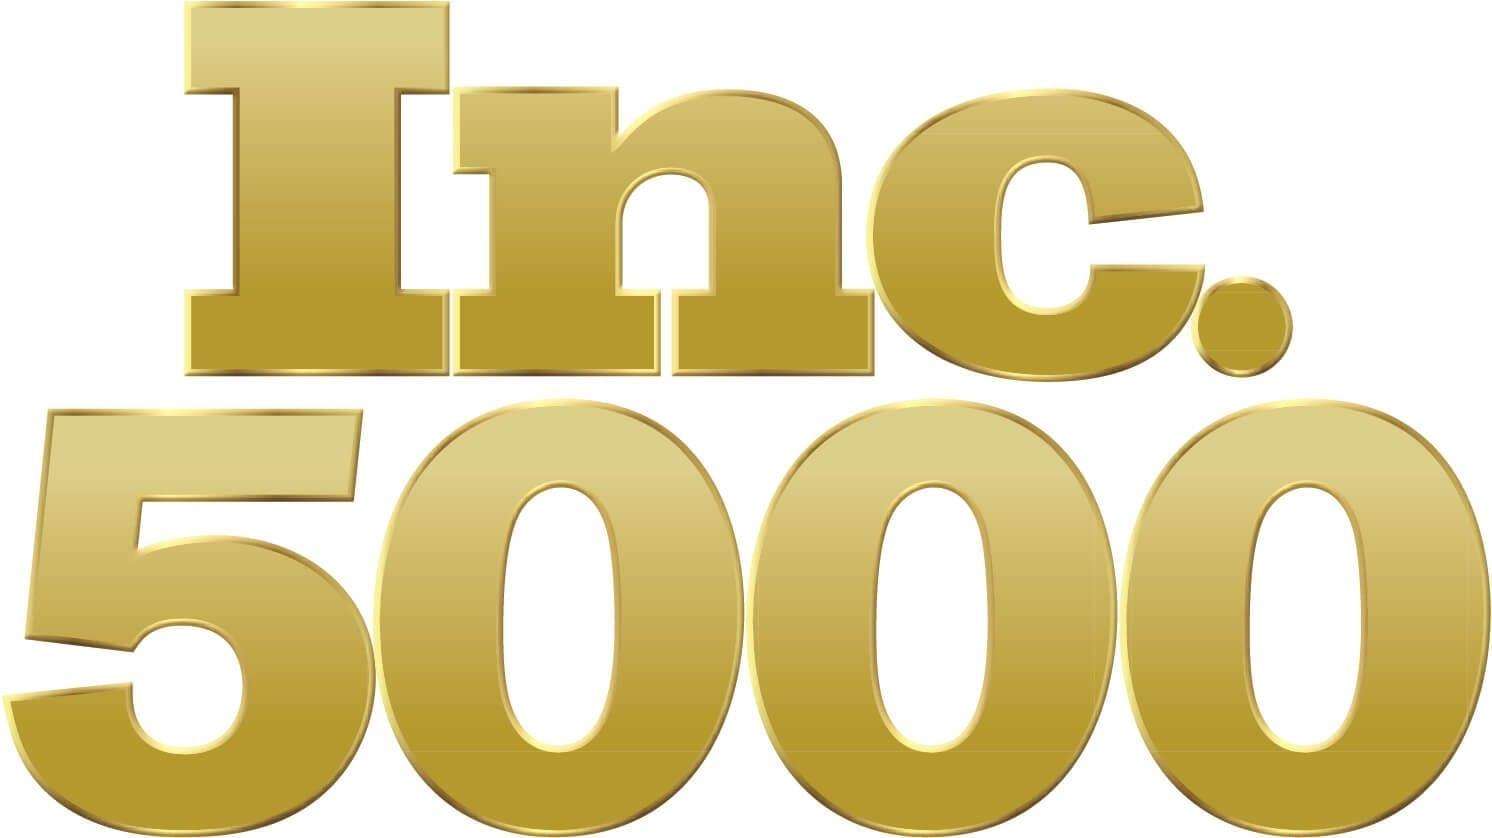 Inc5000 gold